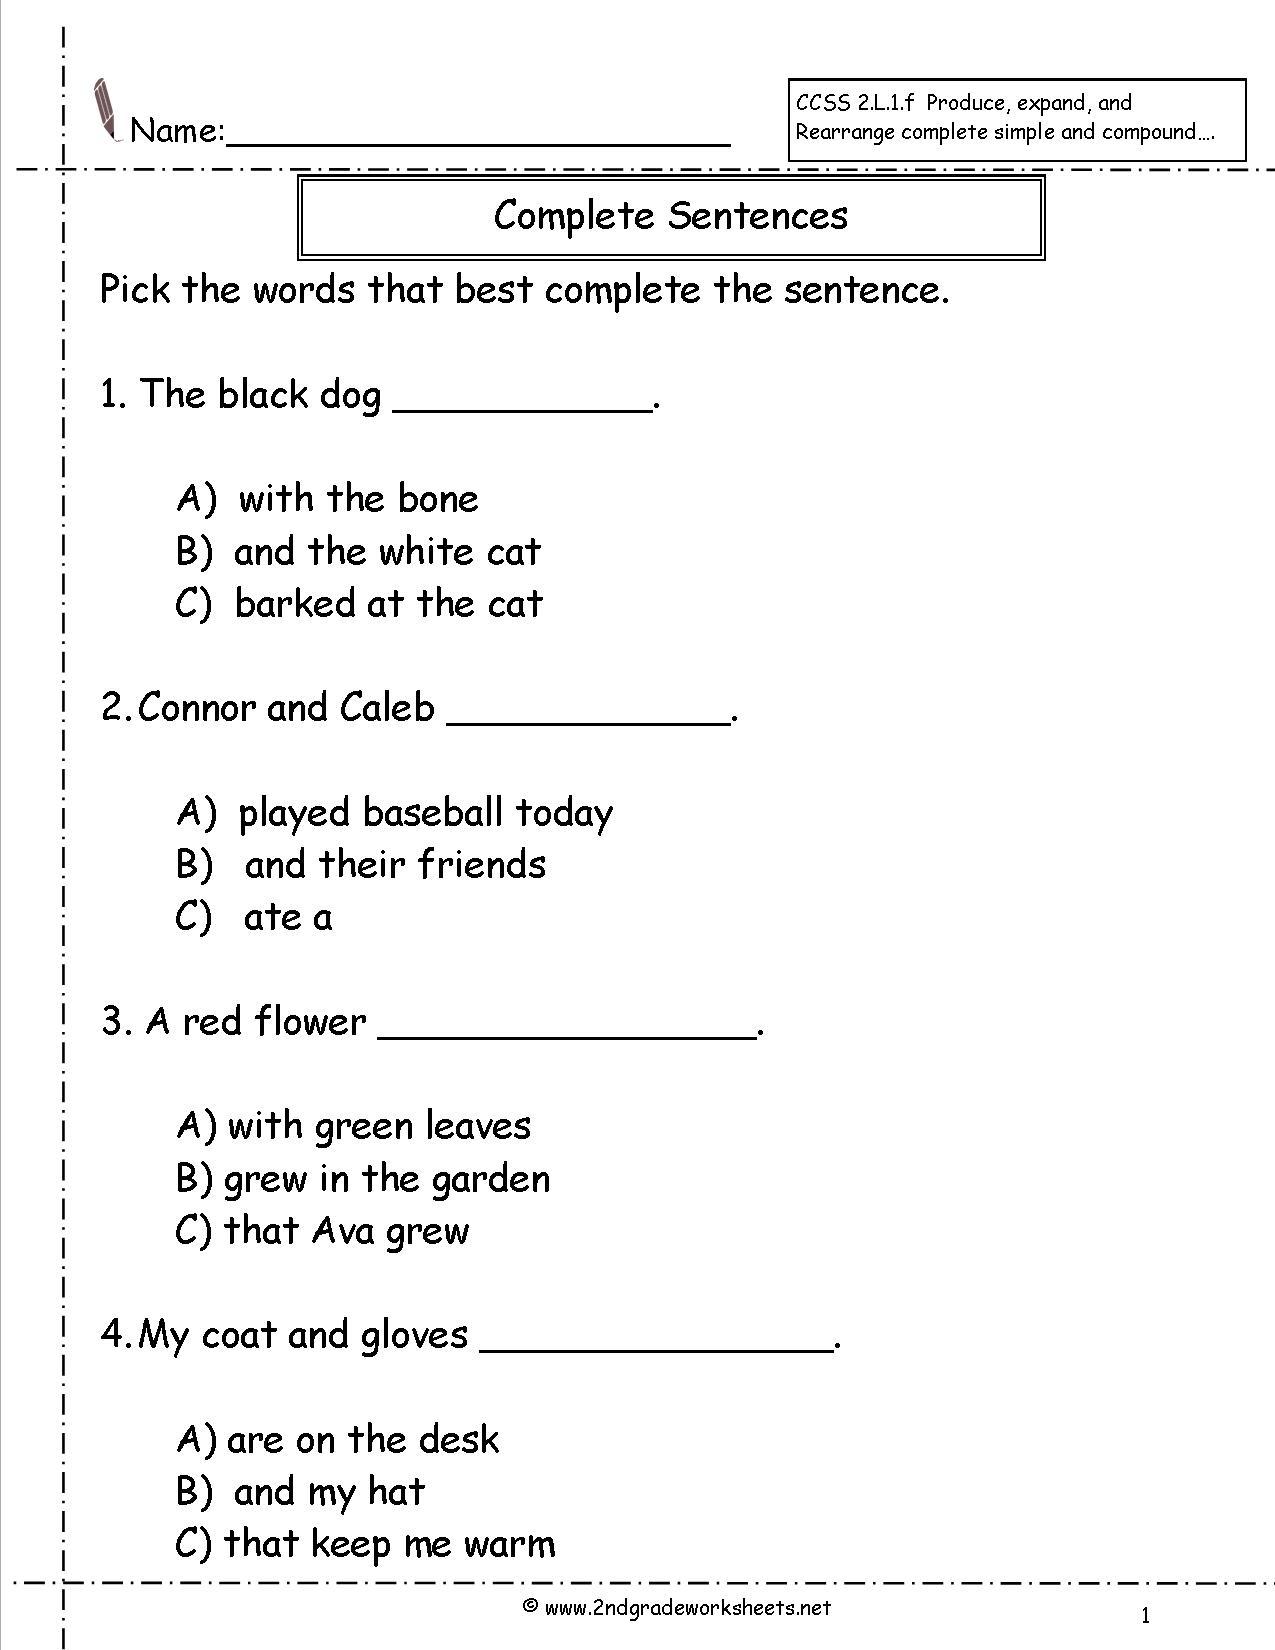 16 Best Images Of Kindergarten Writing Sentences Worksheet